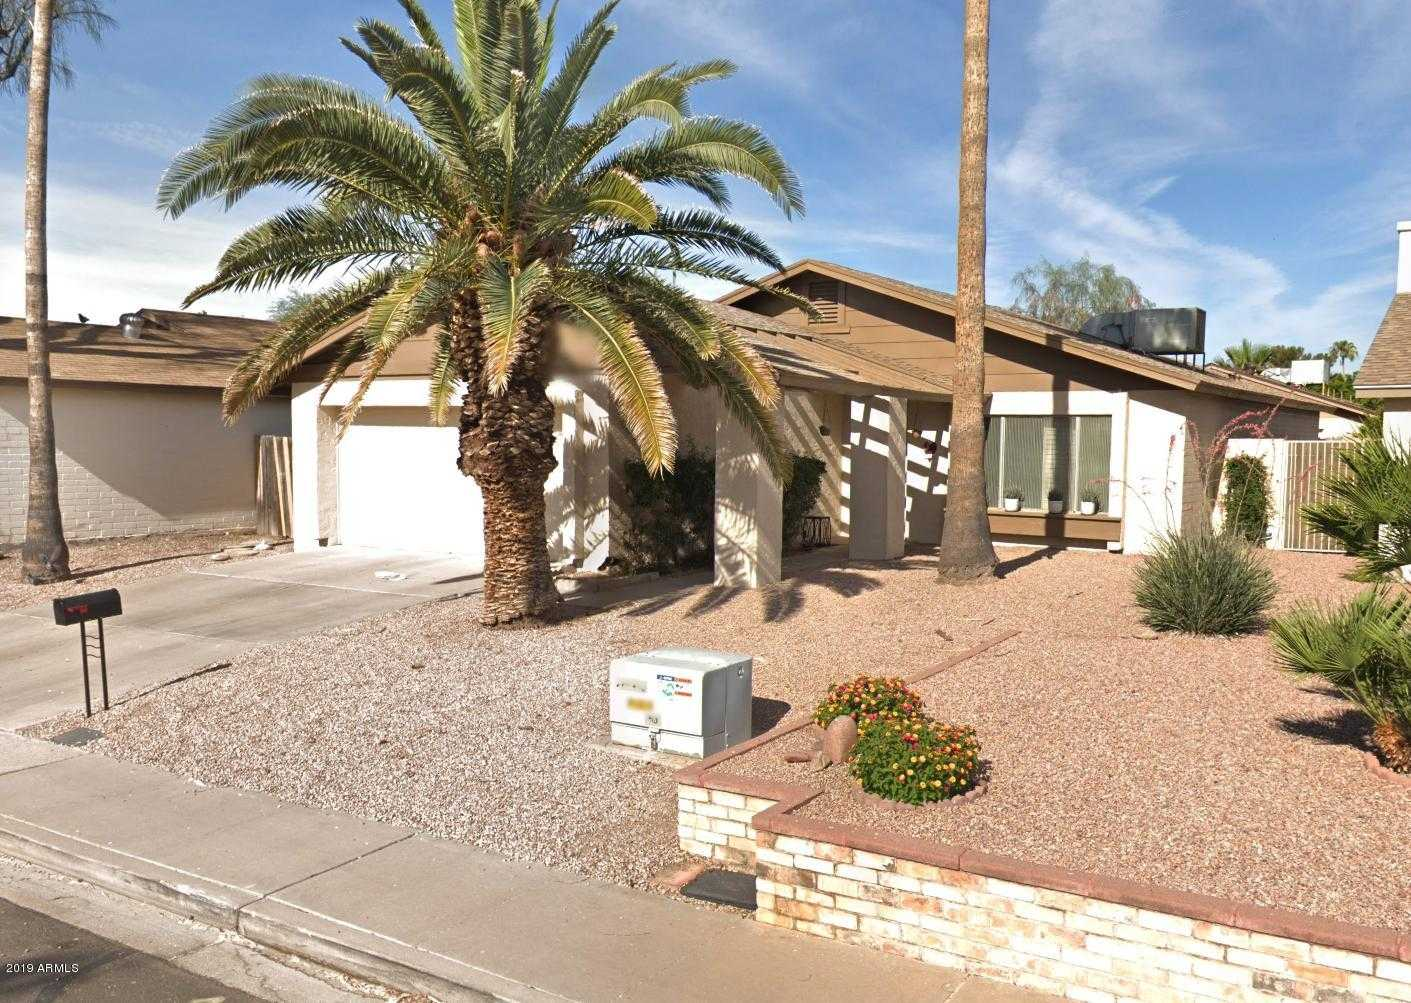 $286,900 - 2Br/2Ba - Home for Sale in Trails At Scottsdale 2 Lot 173-289 & Tr I,j, & O-q, Scottsdale